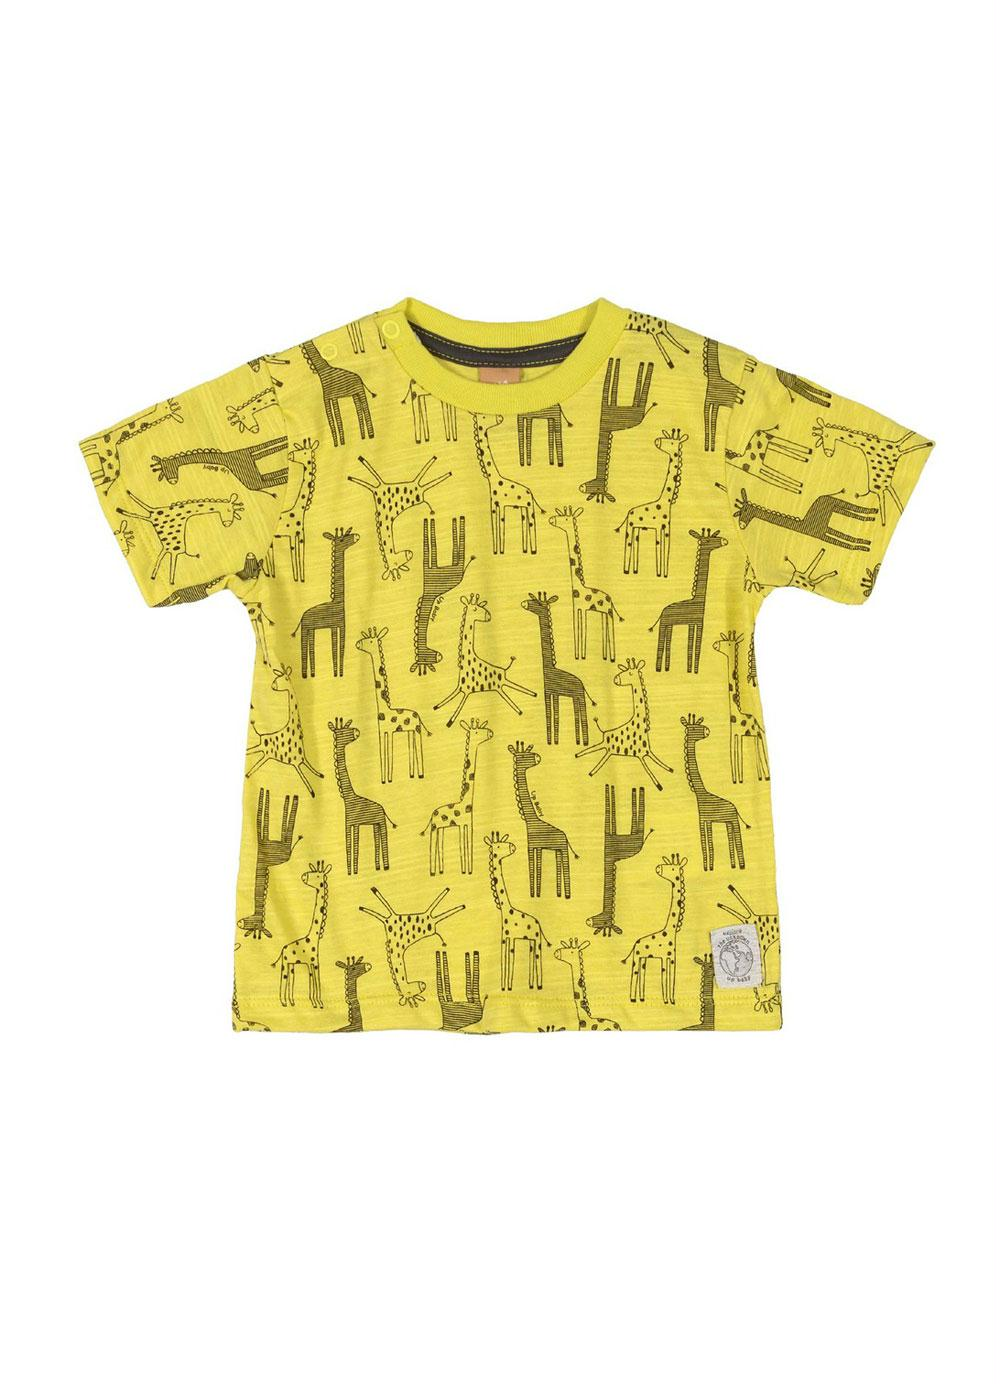 Camiseta manga curta amarela girafas - UP Baby  - Kaiuru Kids